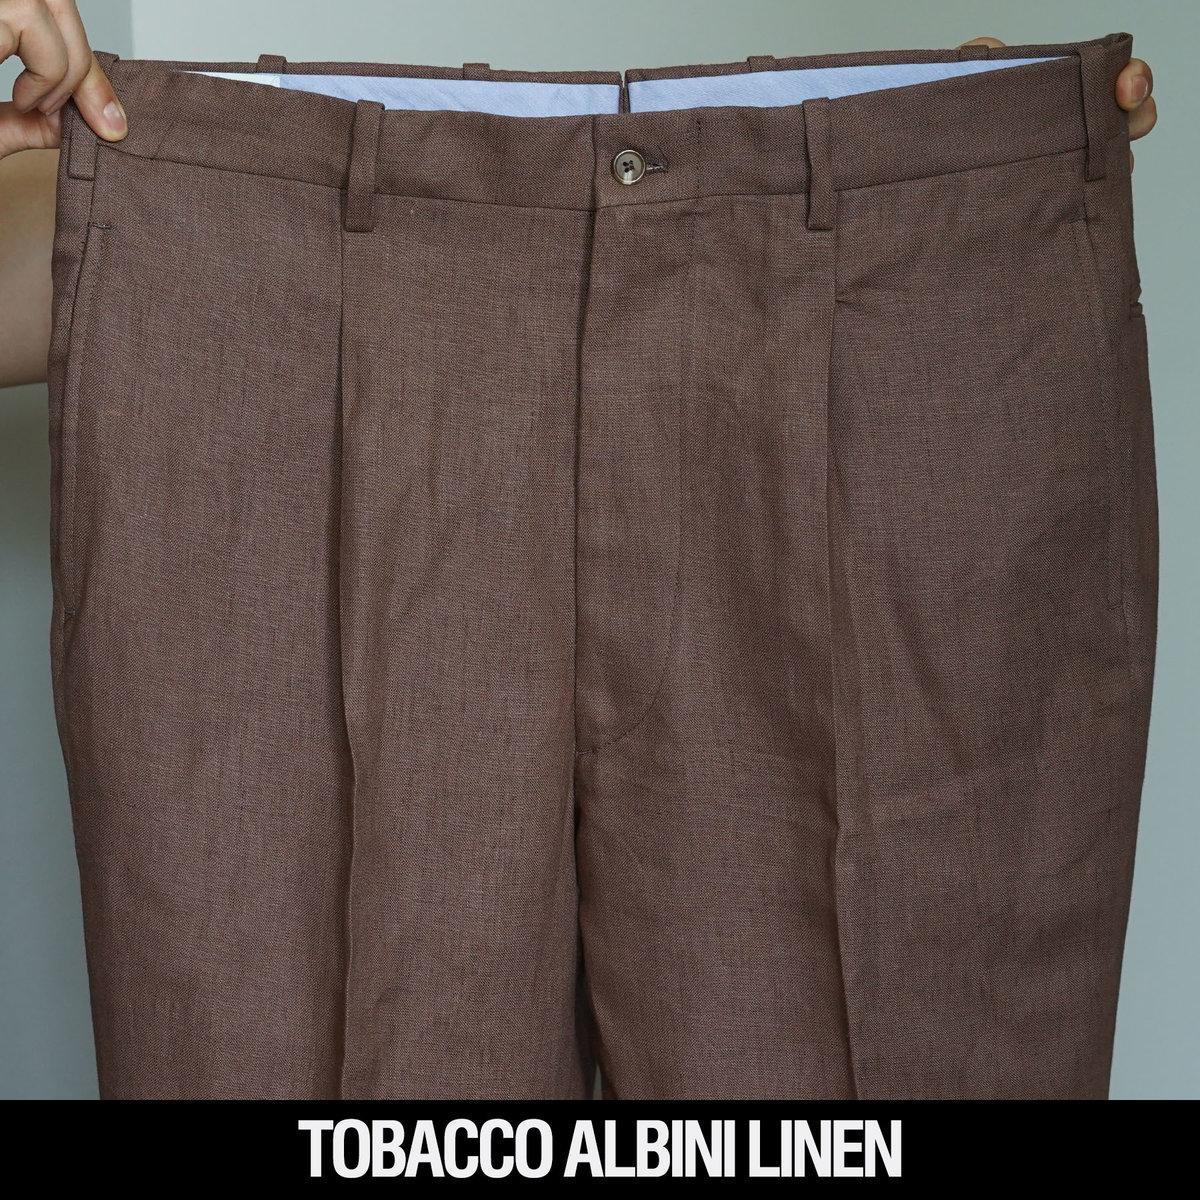 Tobacco Albini LInen.jpg